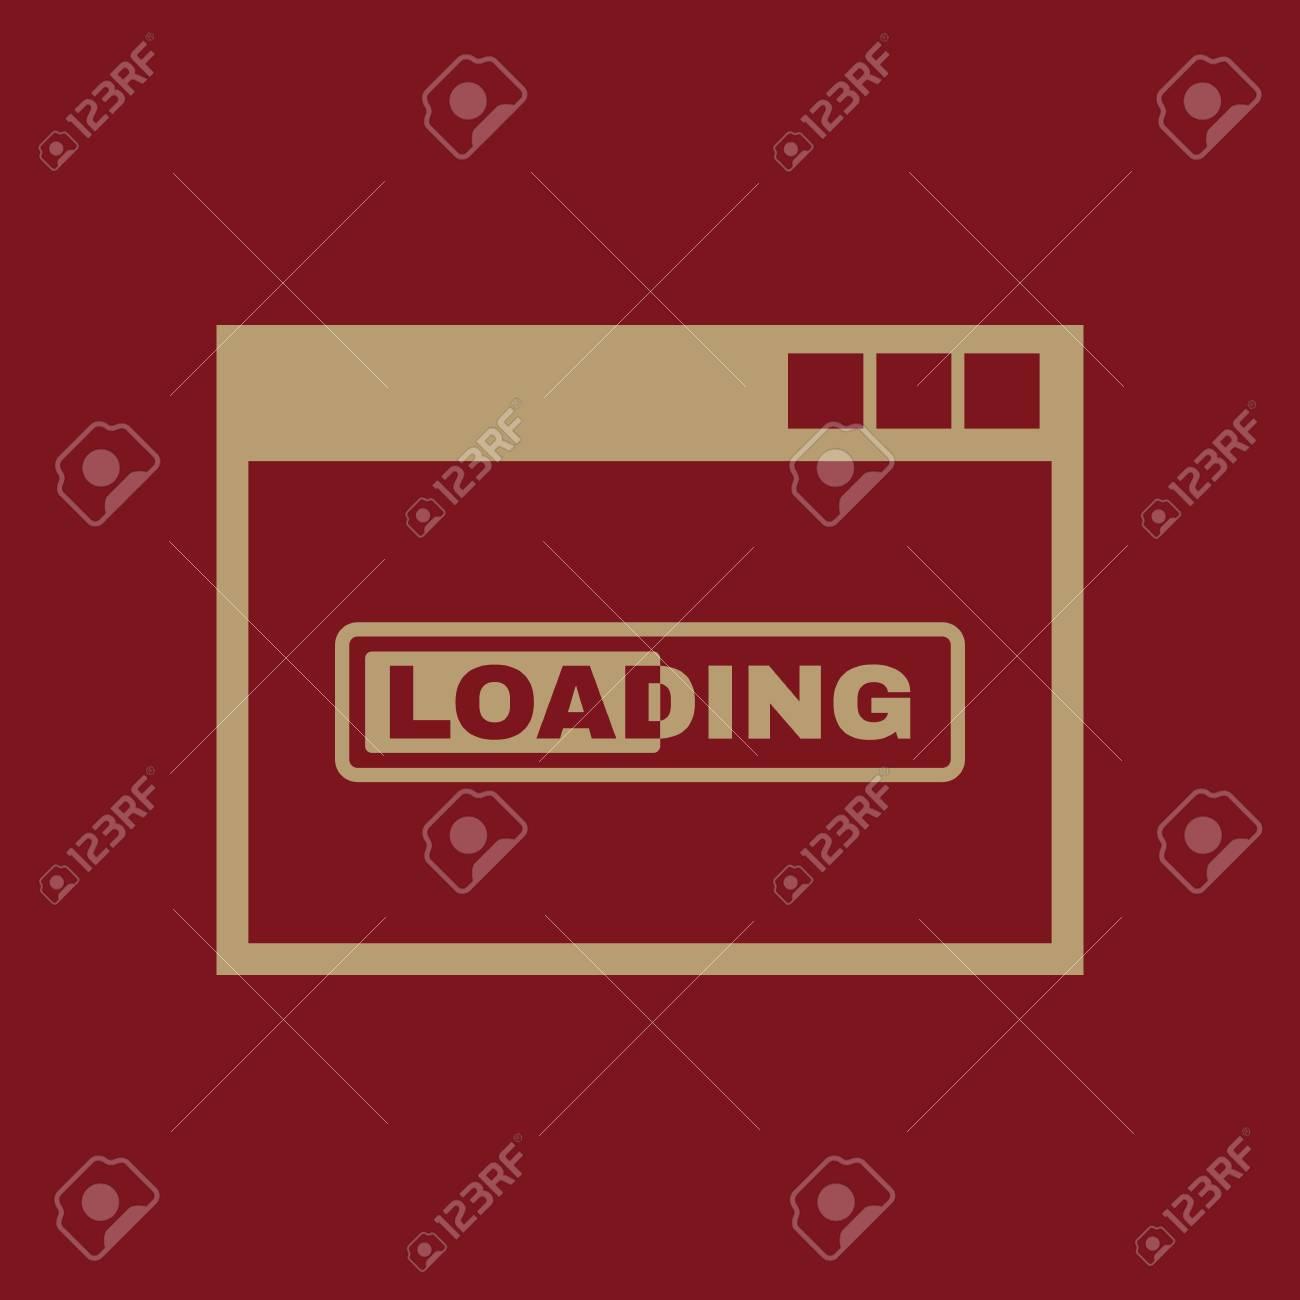 Loading icon vector design loading symbol web graphic jpg loading icon vector design loading symbol web graphic jpg ai biocorpaavc Image collections